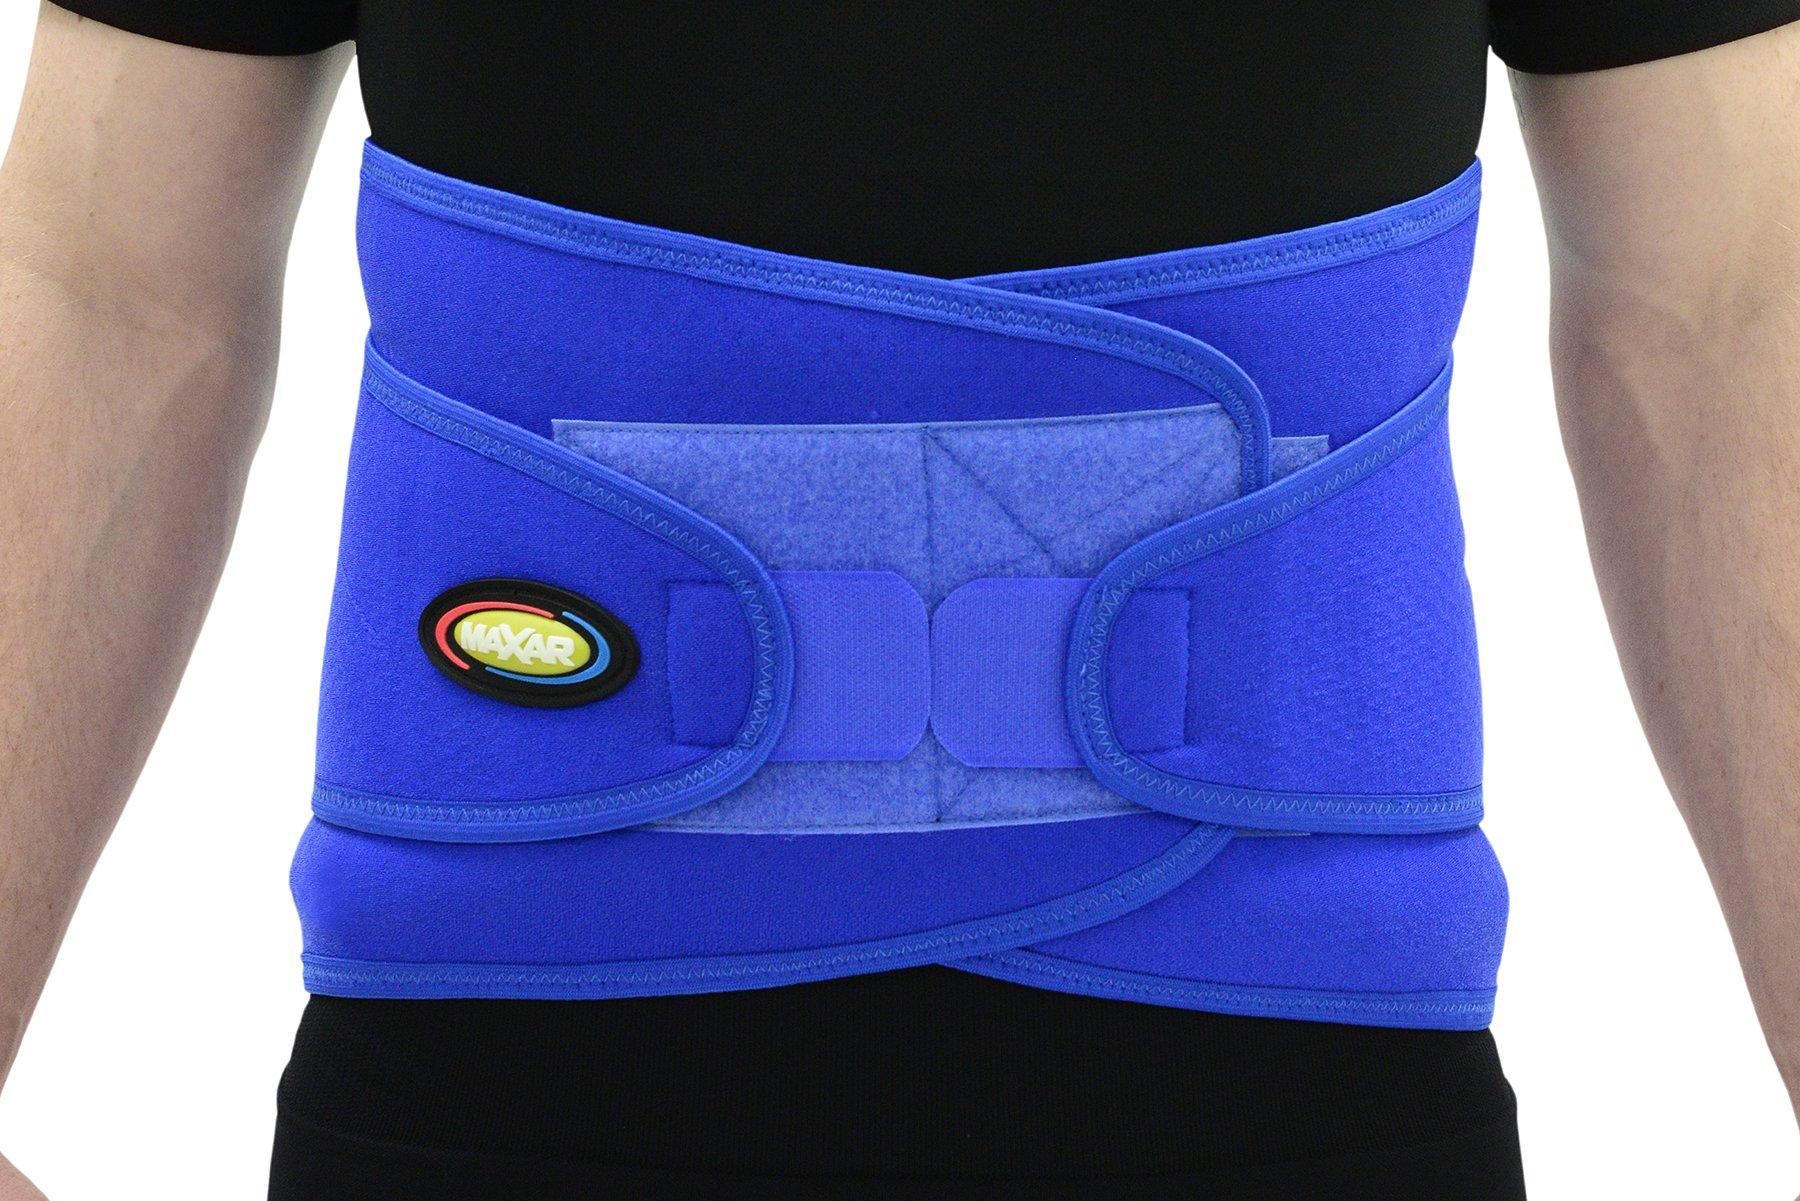 Maxar Airprene (Breathable Neoprene) Sport Belt (Lumbo-Sacral Support), Small, Blue by Maxar